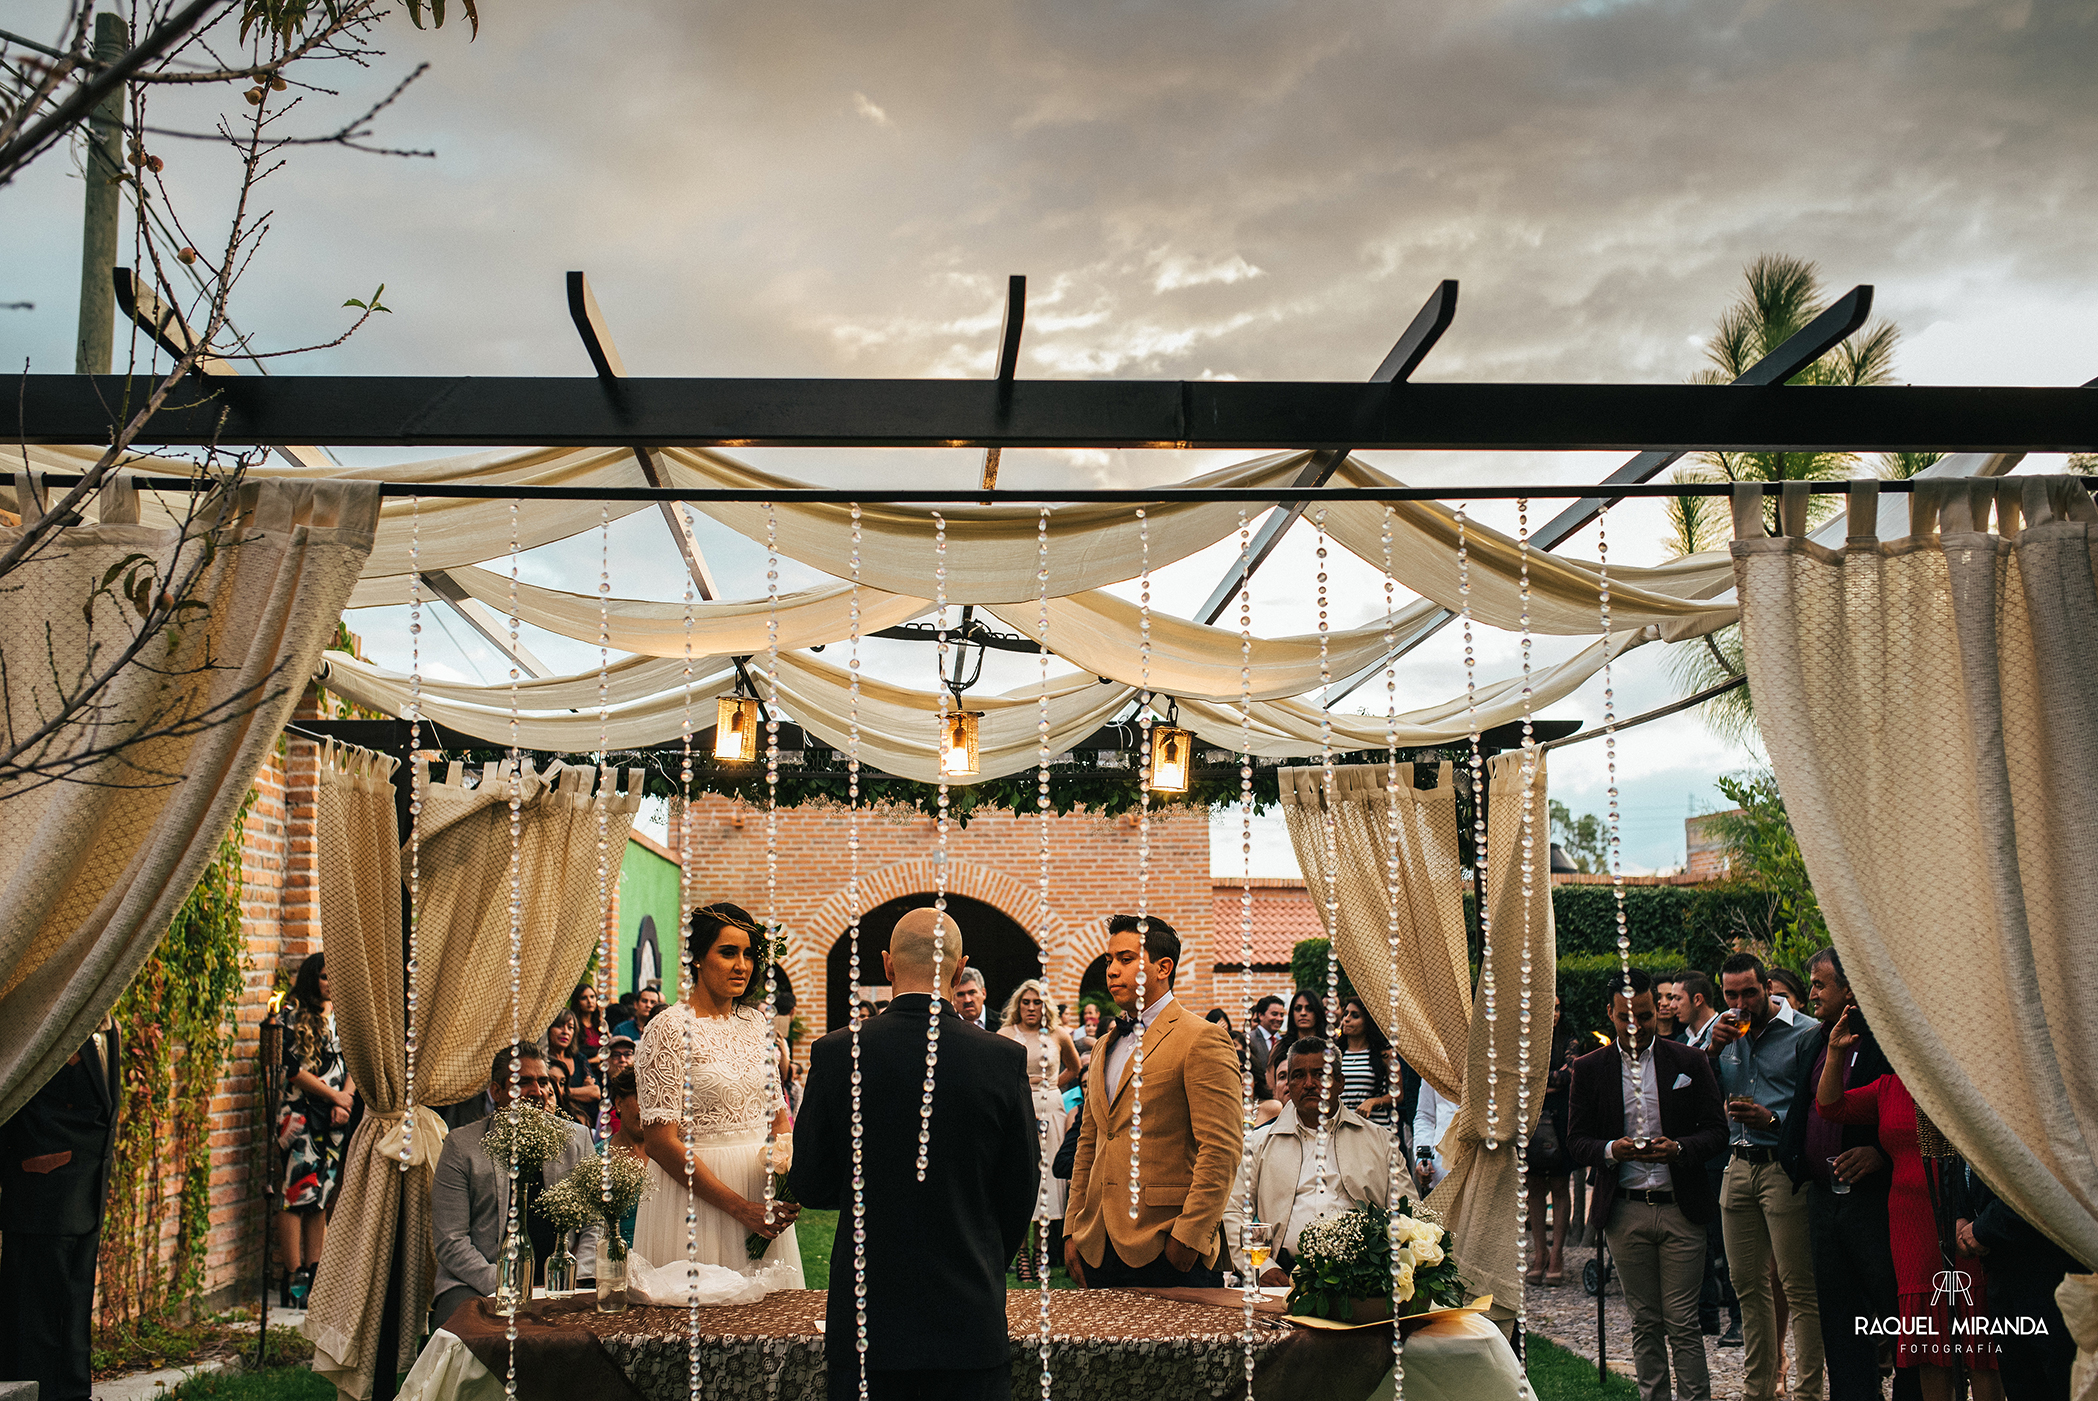 raquel miranda fotografía | boda civil| paulina&benjamin-4.jpg